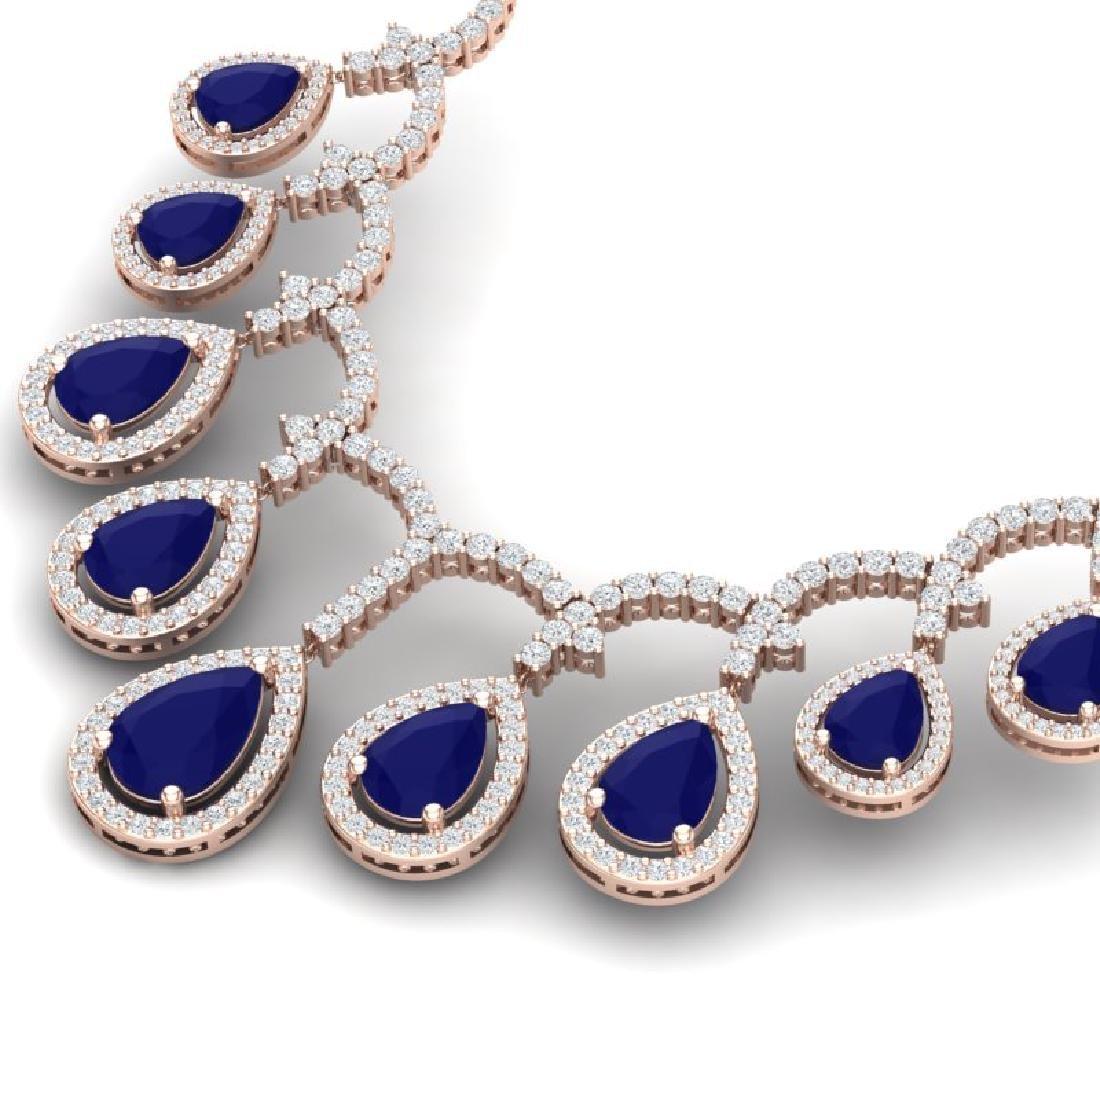 31.5 CTW Royalty Sapphire & VS Diamond Necklace 18K - 2